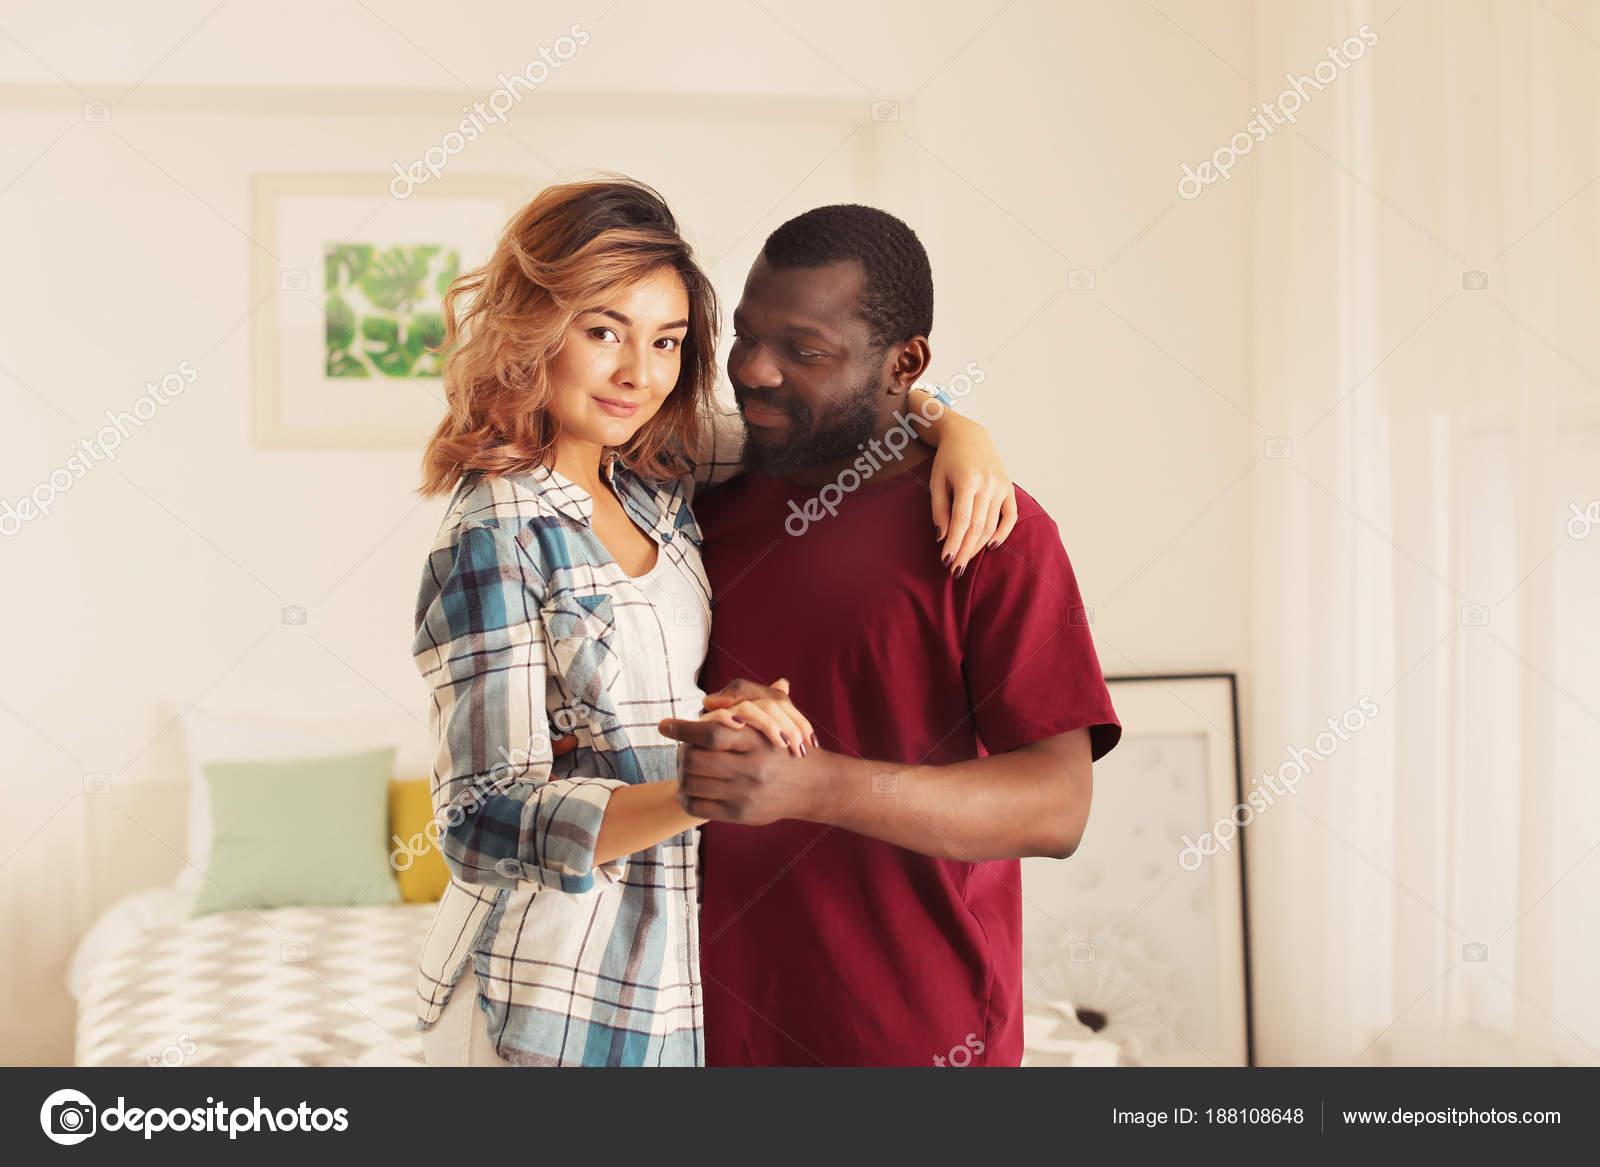 long hair man eating pussy